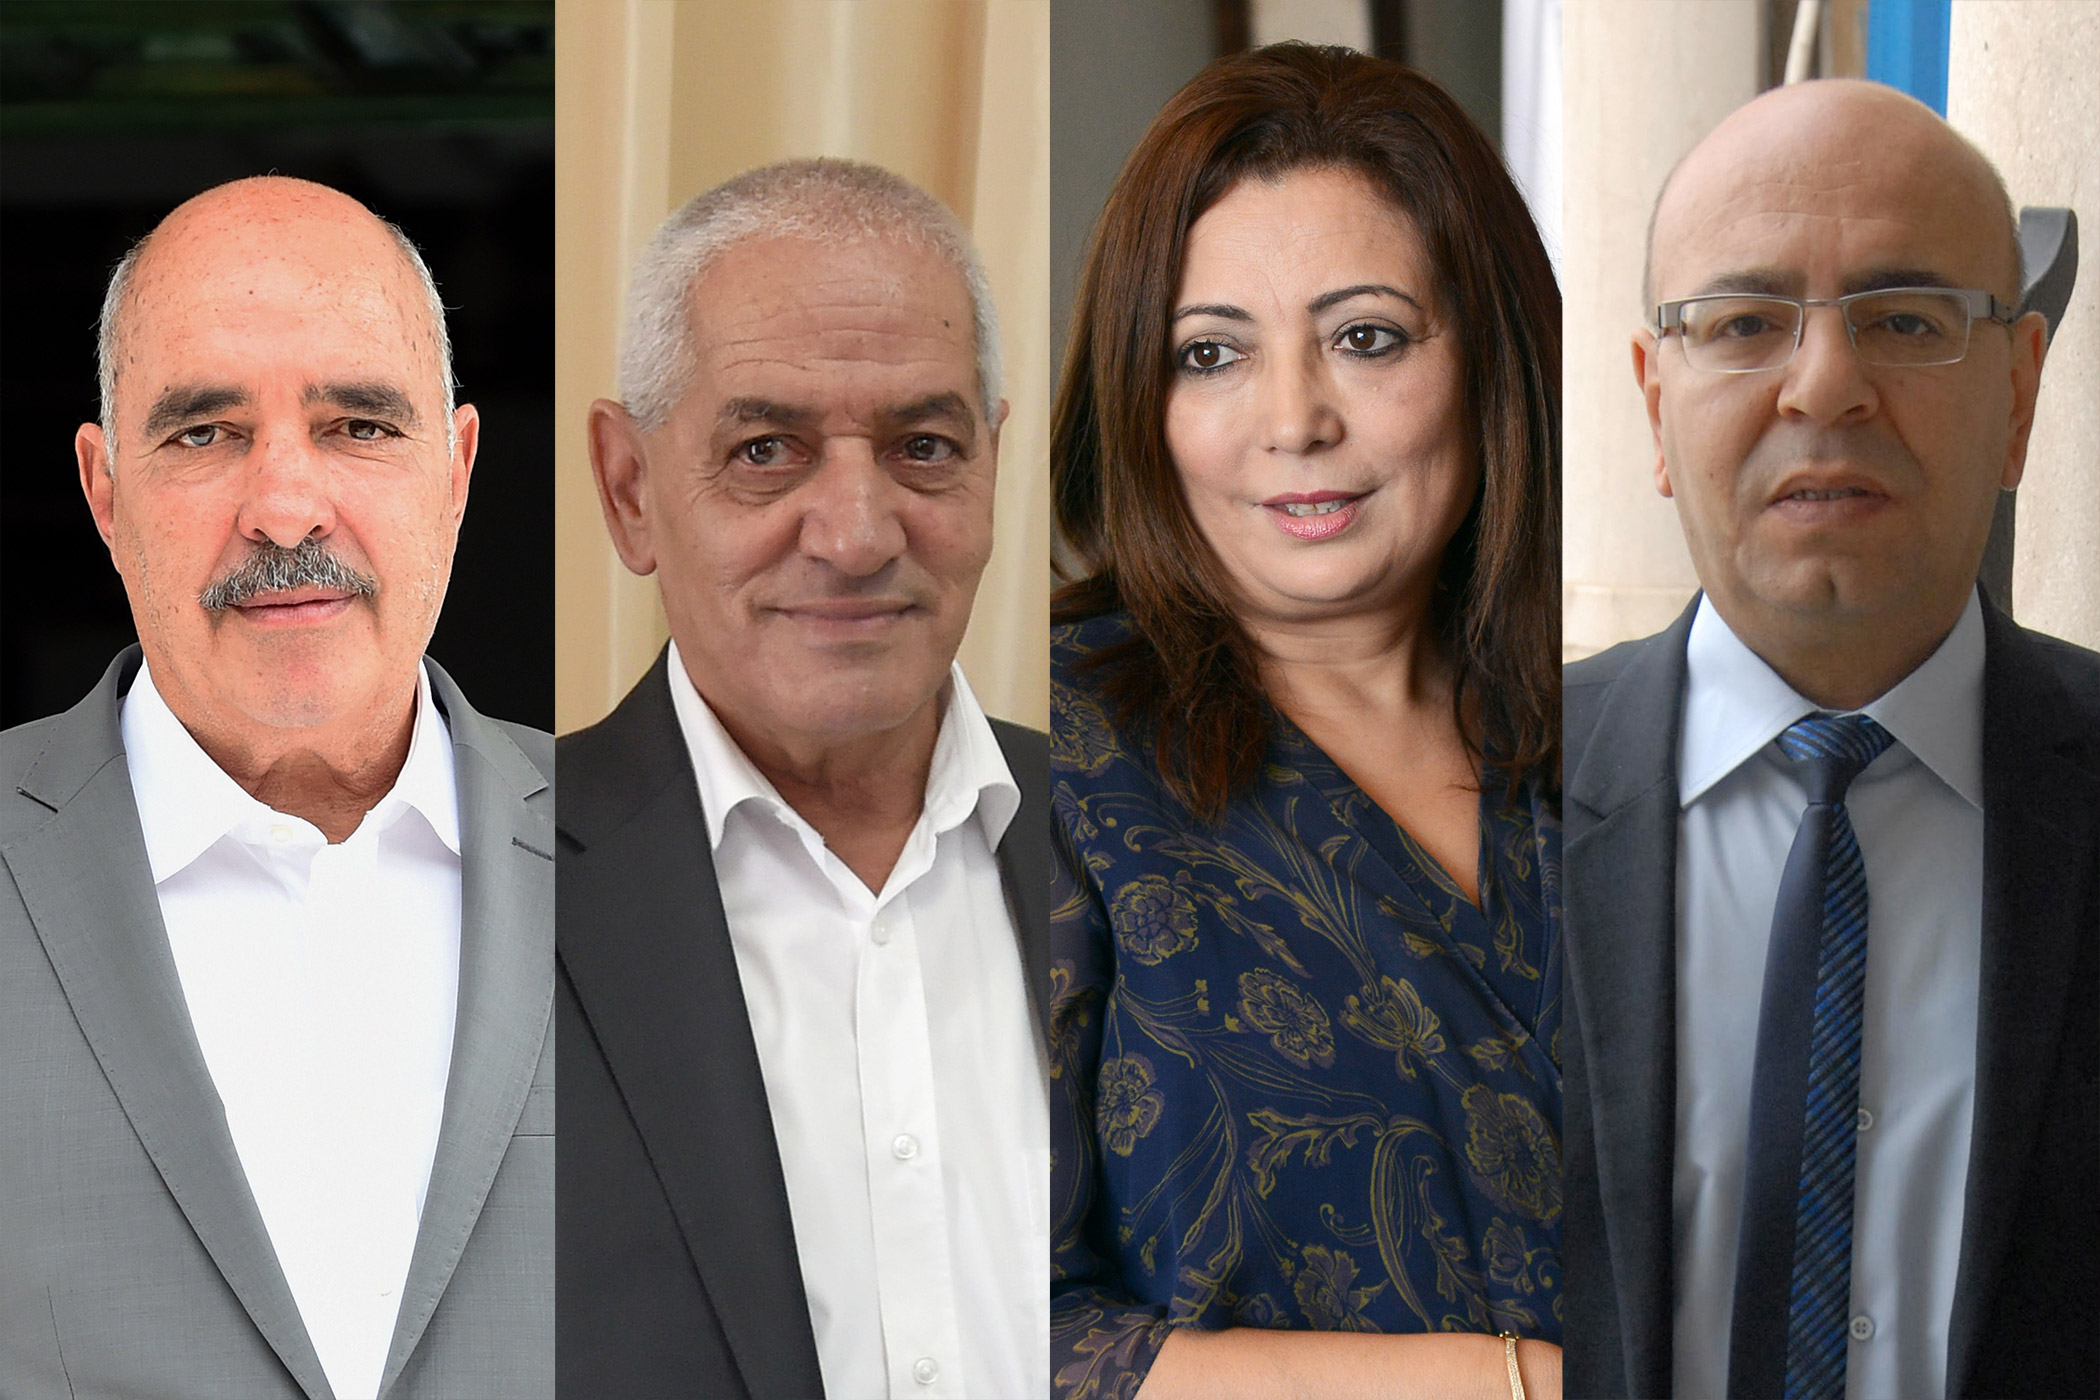 The Tunisian National Dialogue Quartet members: Wilded Bouchamaoui; Fadhel Mahfoudh; Abdessattar ben Moussa and Houcine Abbassi on Oct. 9, 2015.